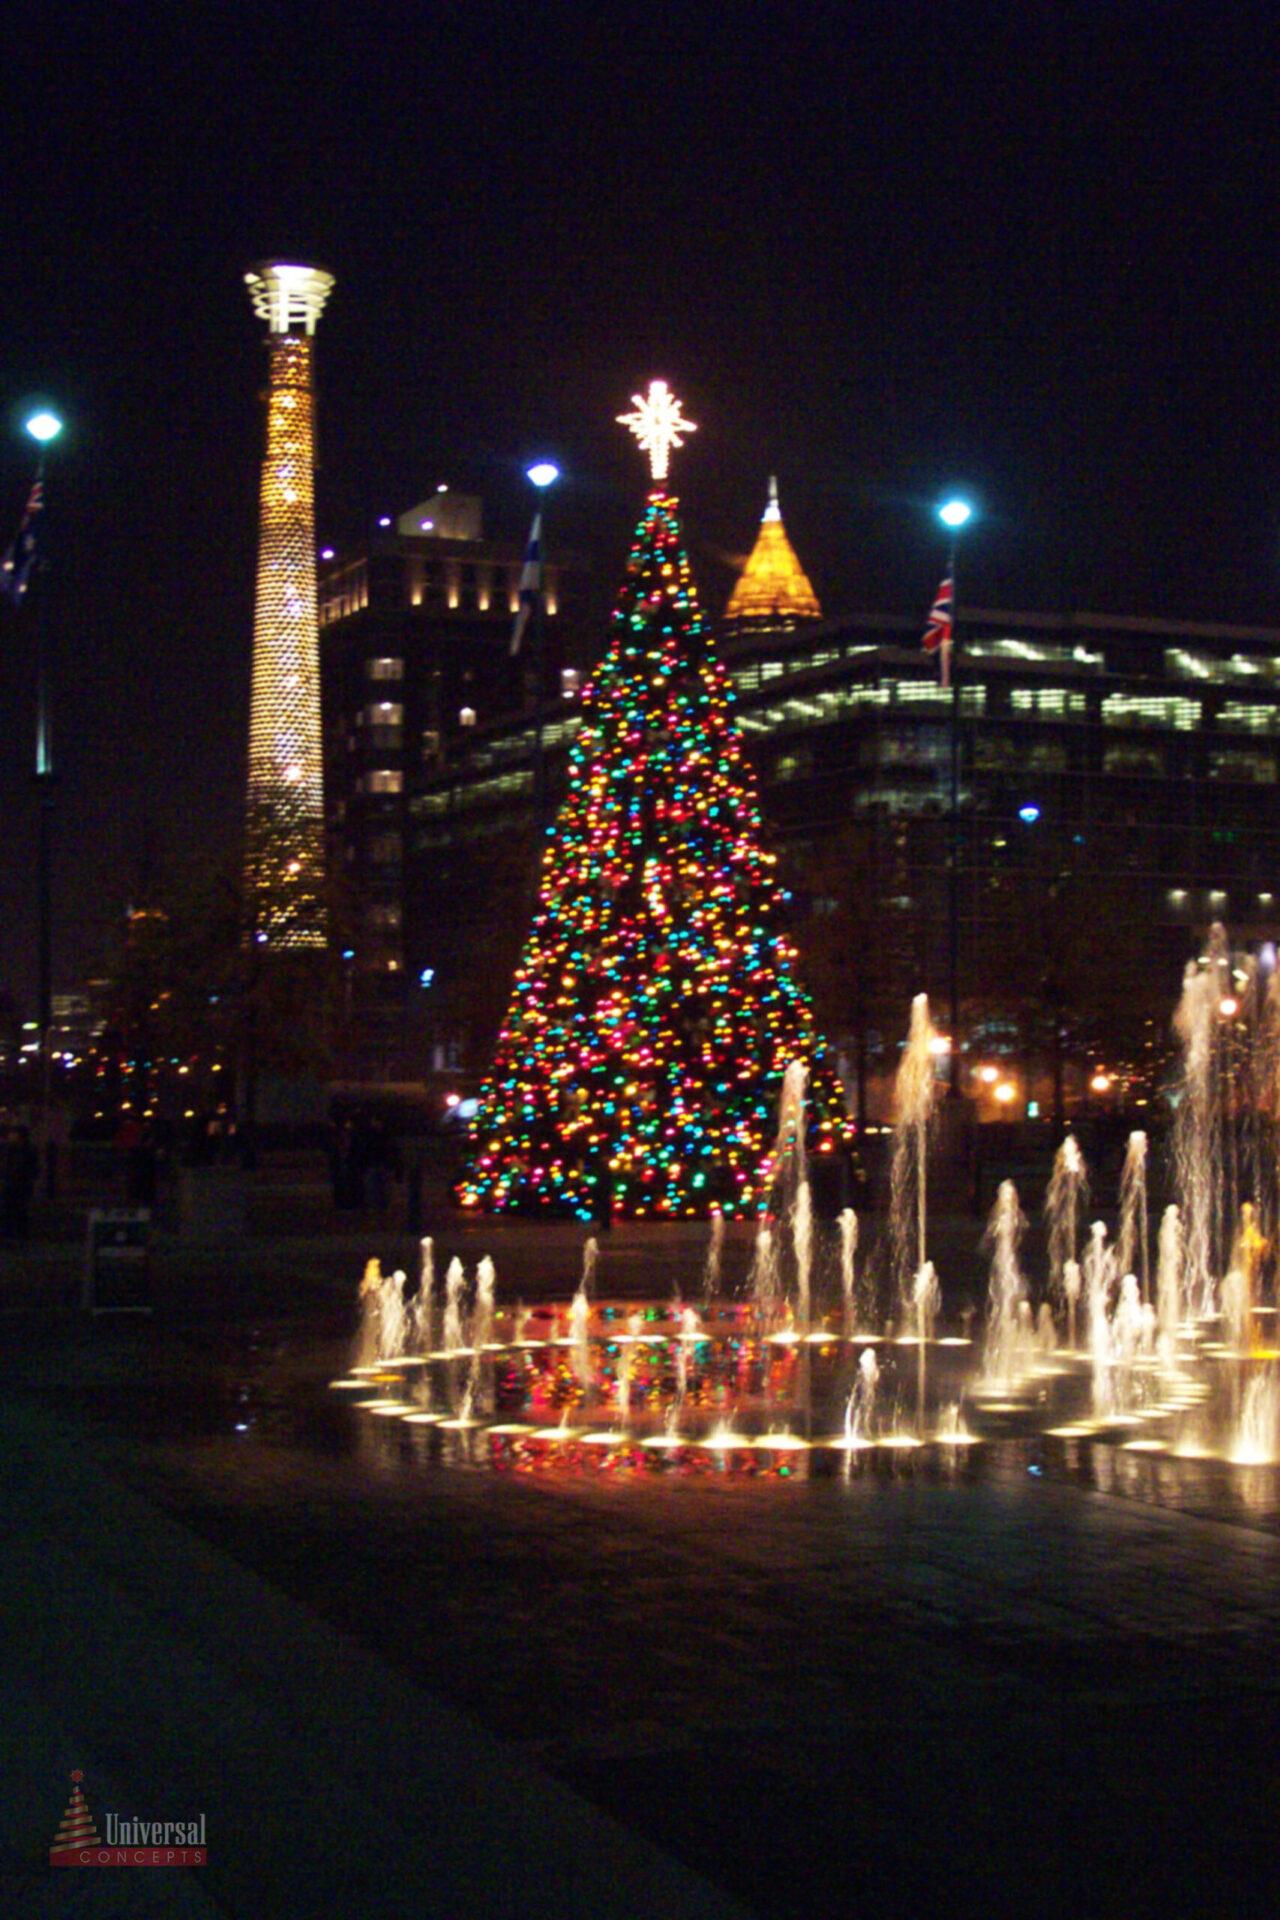 Giant Christmas Panel Tree in Downtown Atlanta